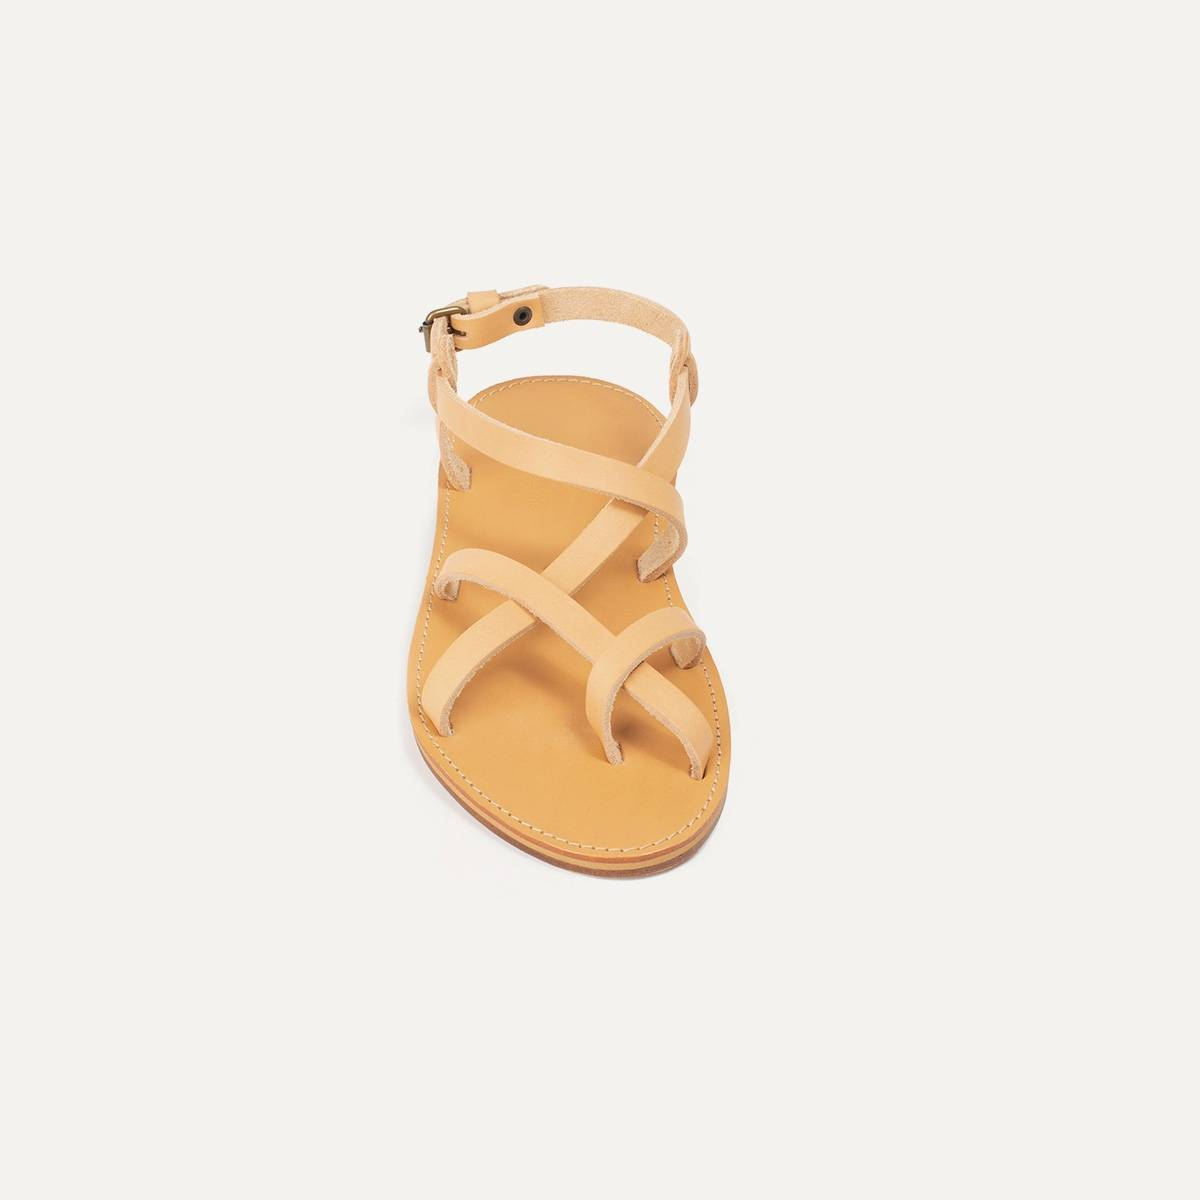 Nara leather sandals - Natural (image n°3)